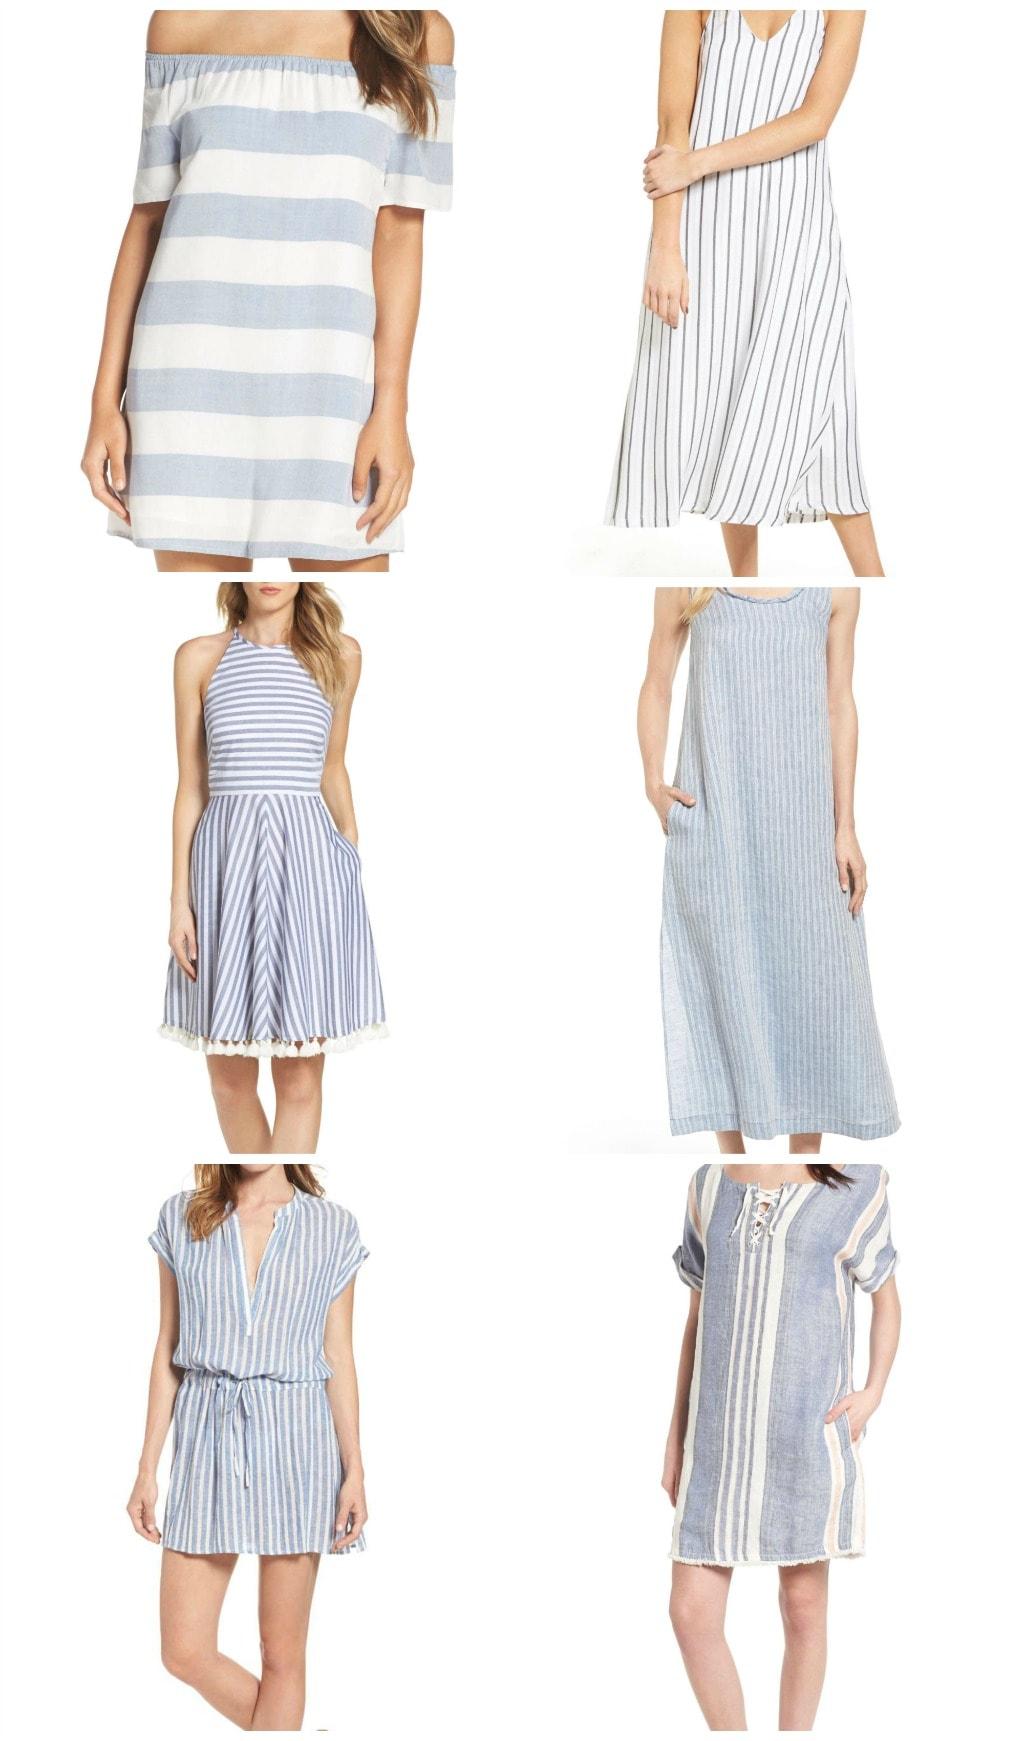 striped dress roundup